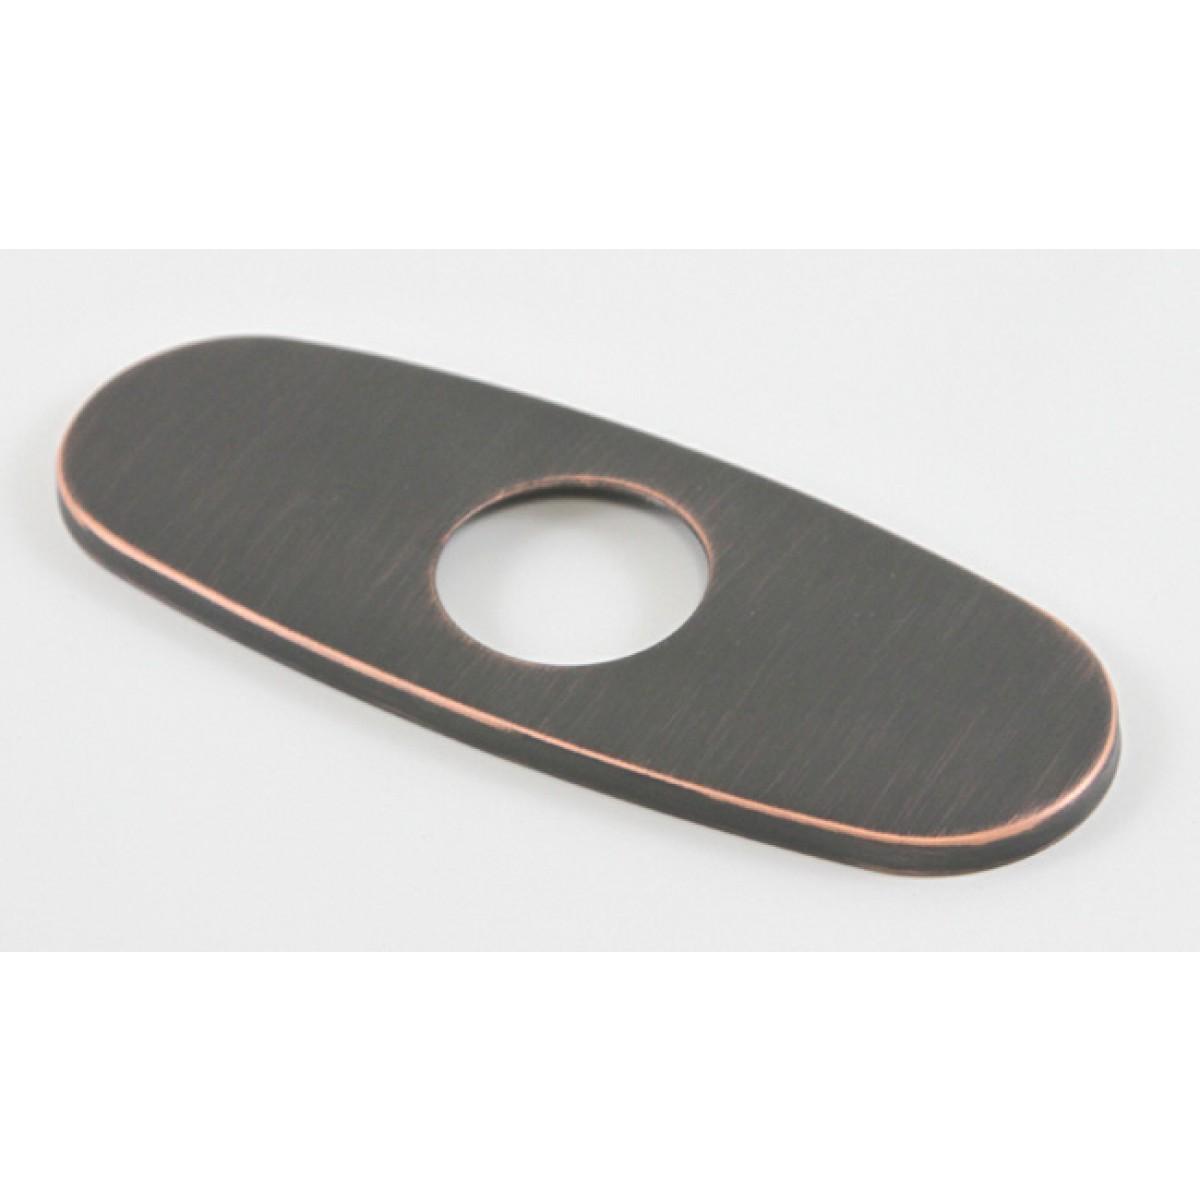 Bathroom Single Hole Sink Faucet Cover Deck Plate Escutcheon with Round  Corners - Venetian Bronze